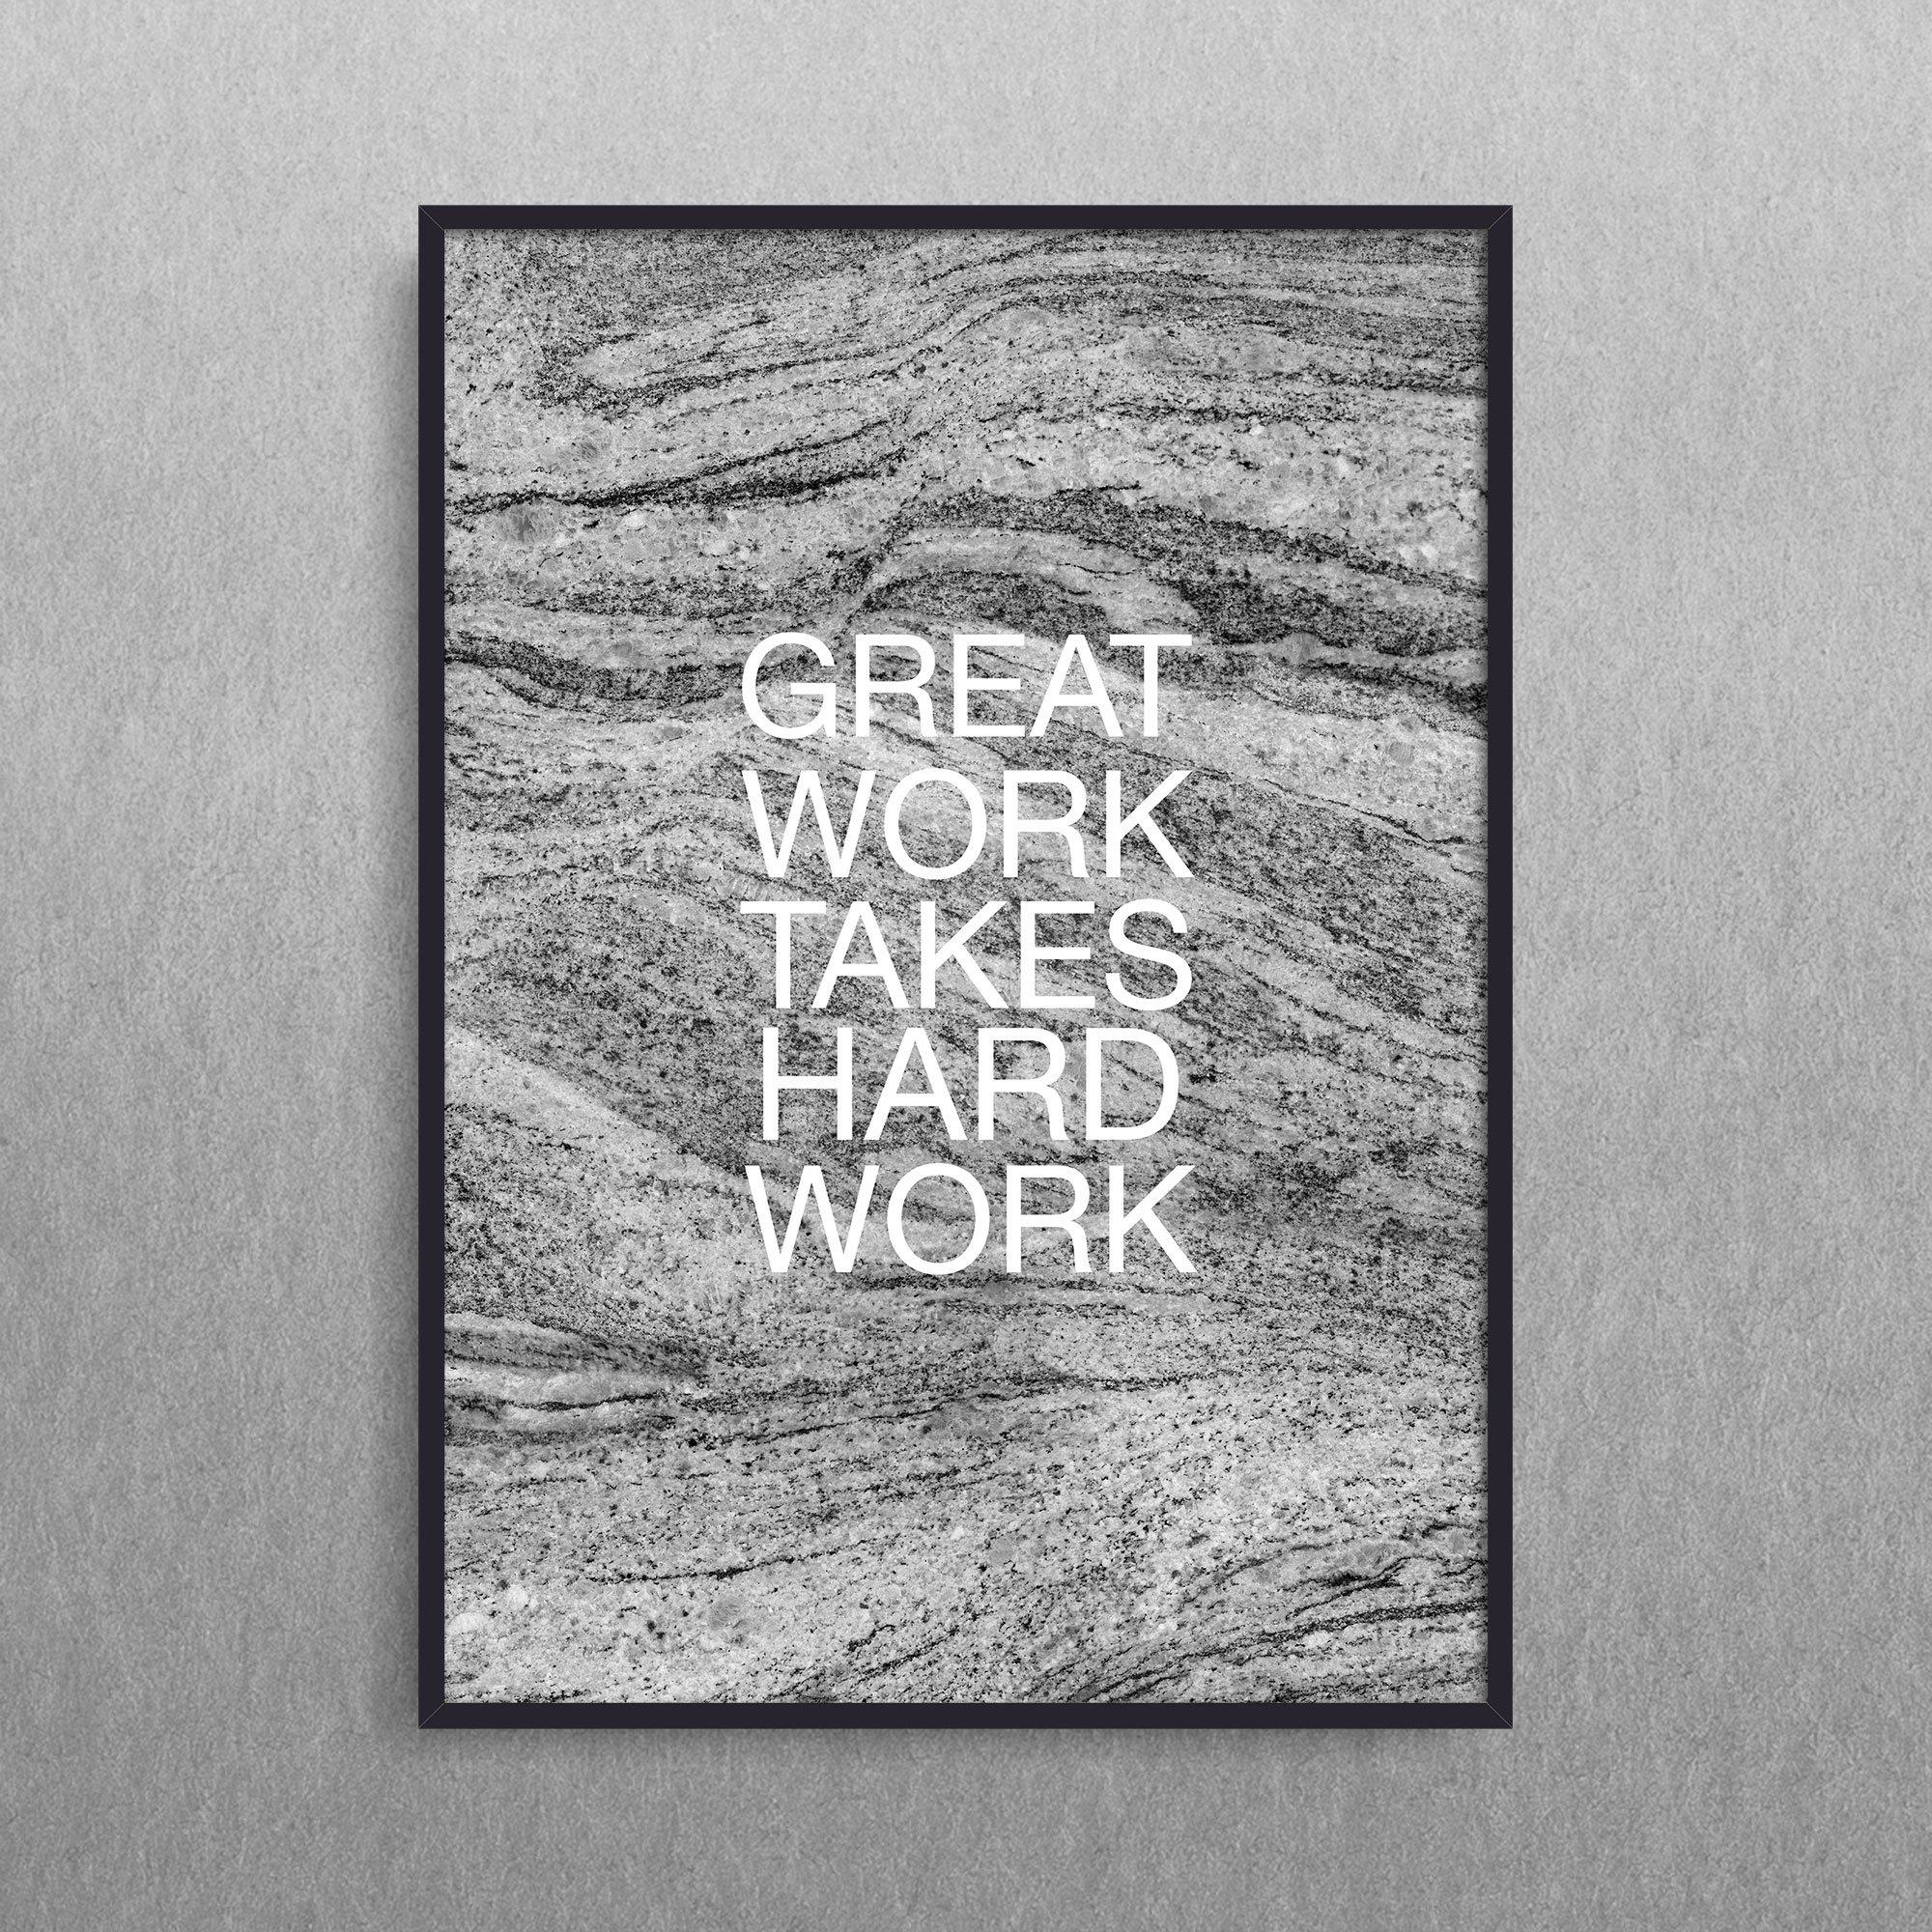 Great work takes hard work